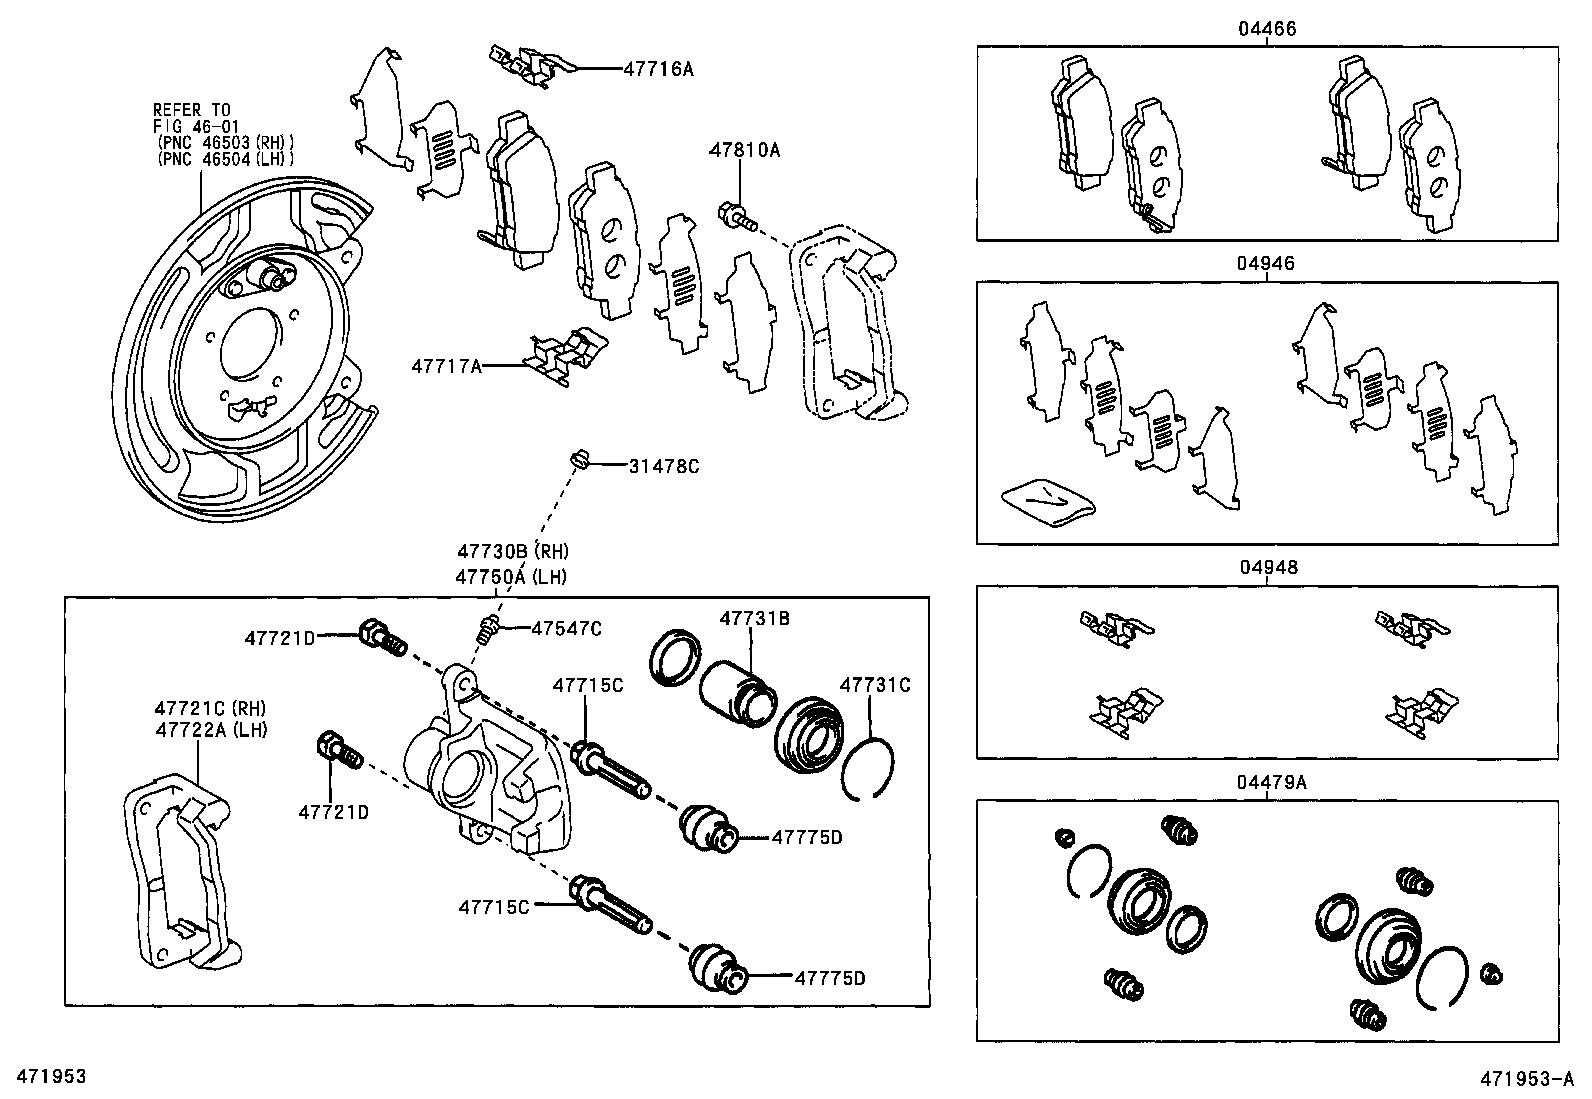 [DIAGRAM] 1996 Previa Wiring Diagram FULL Version HD